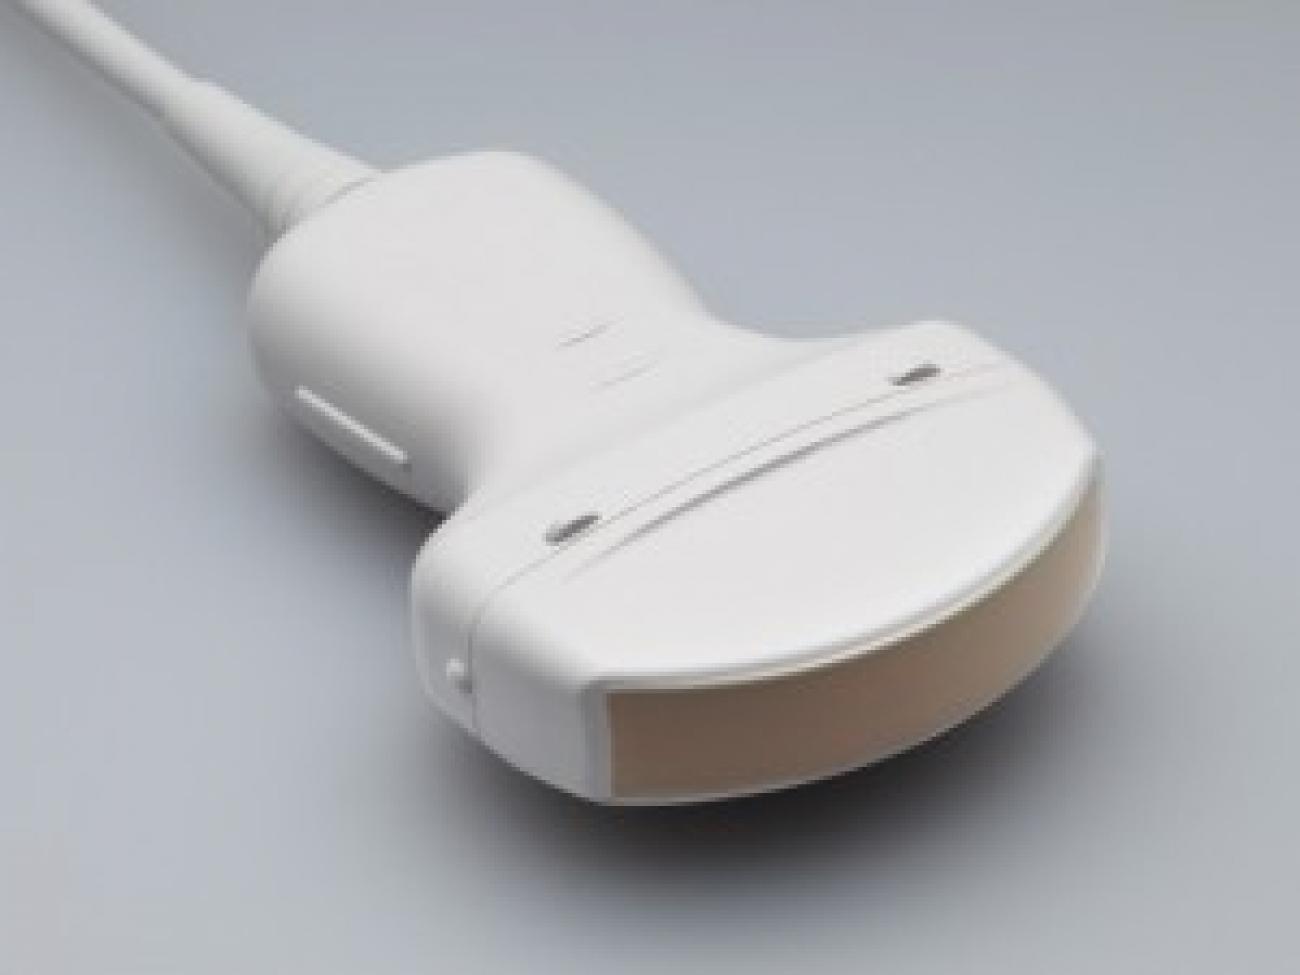 Датчик Hitachi Aloka UST-9147